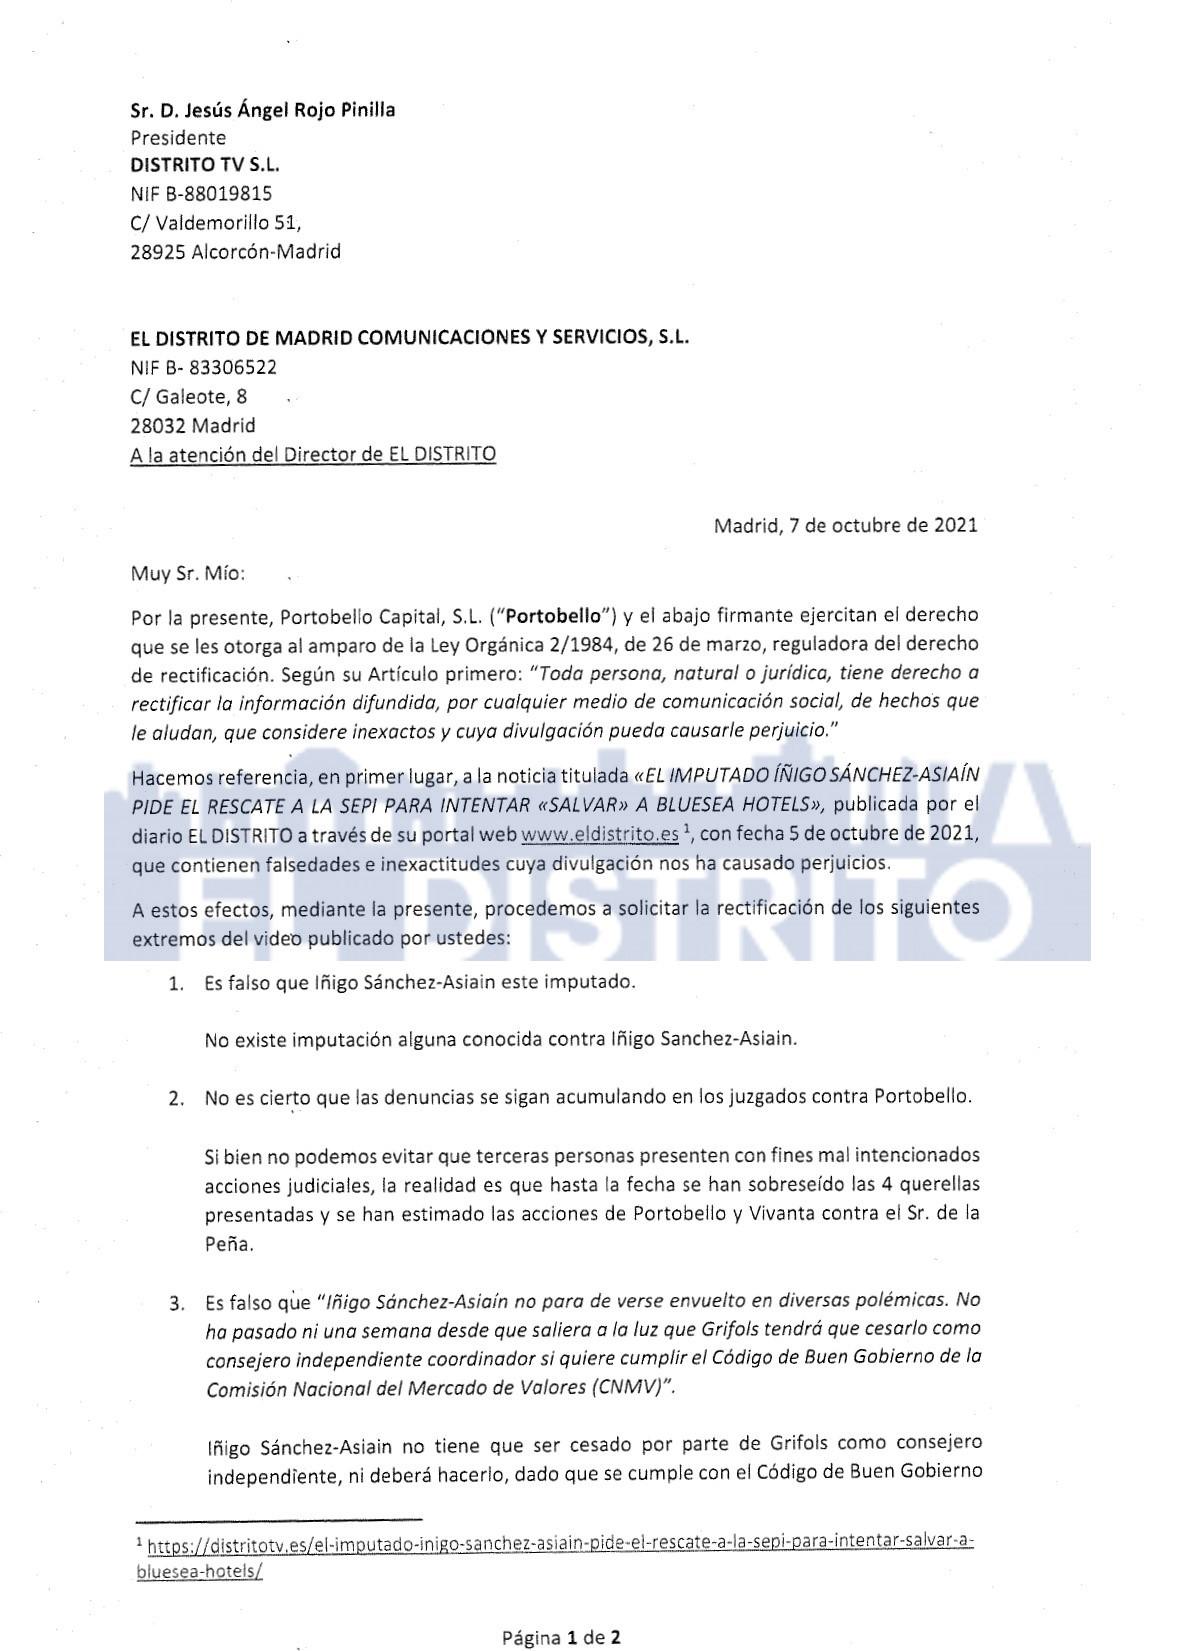 Íñigo Sánchez-Asiaín mintió al negar que está imputado por un delito de estafa